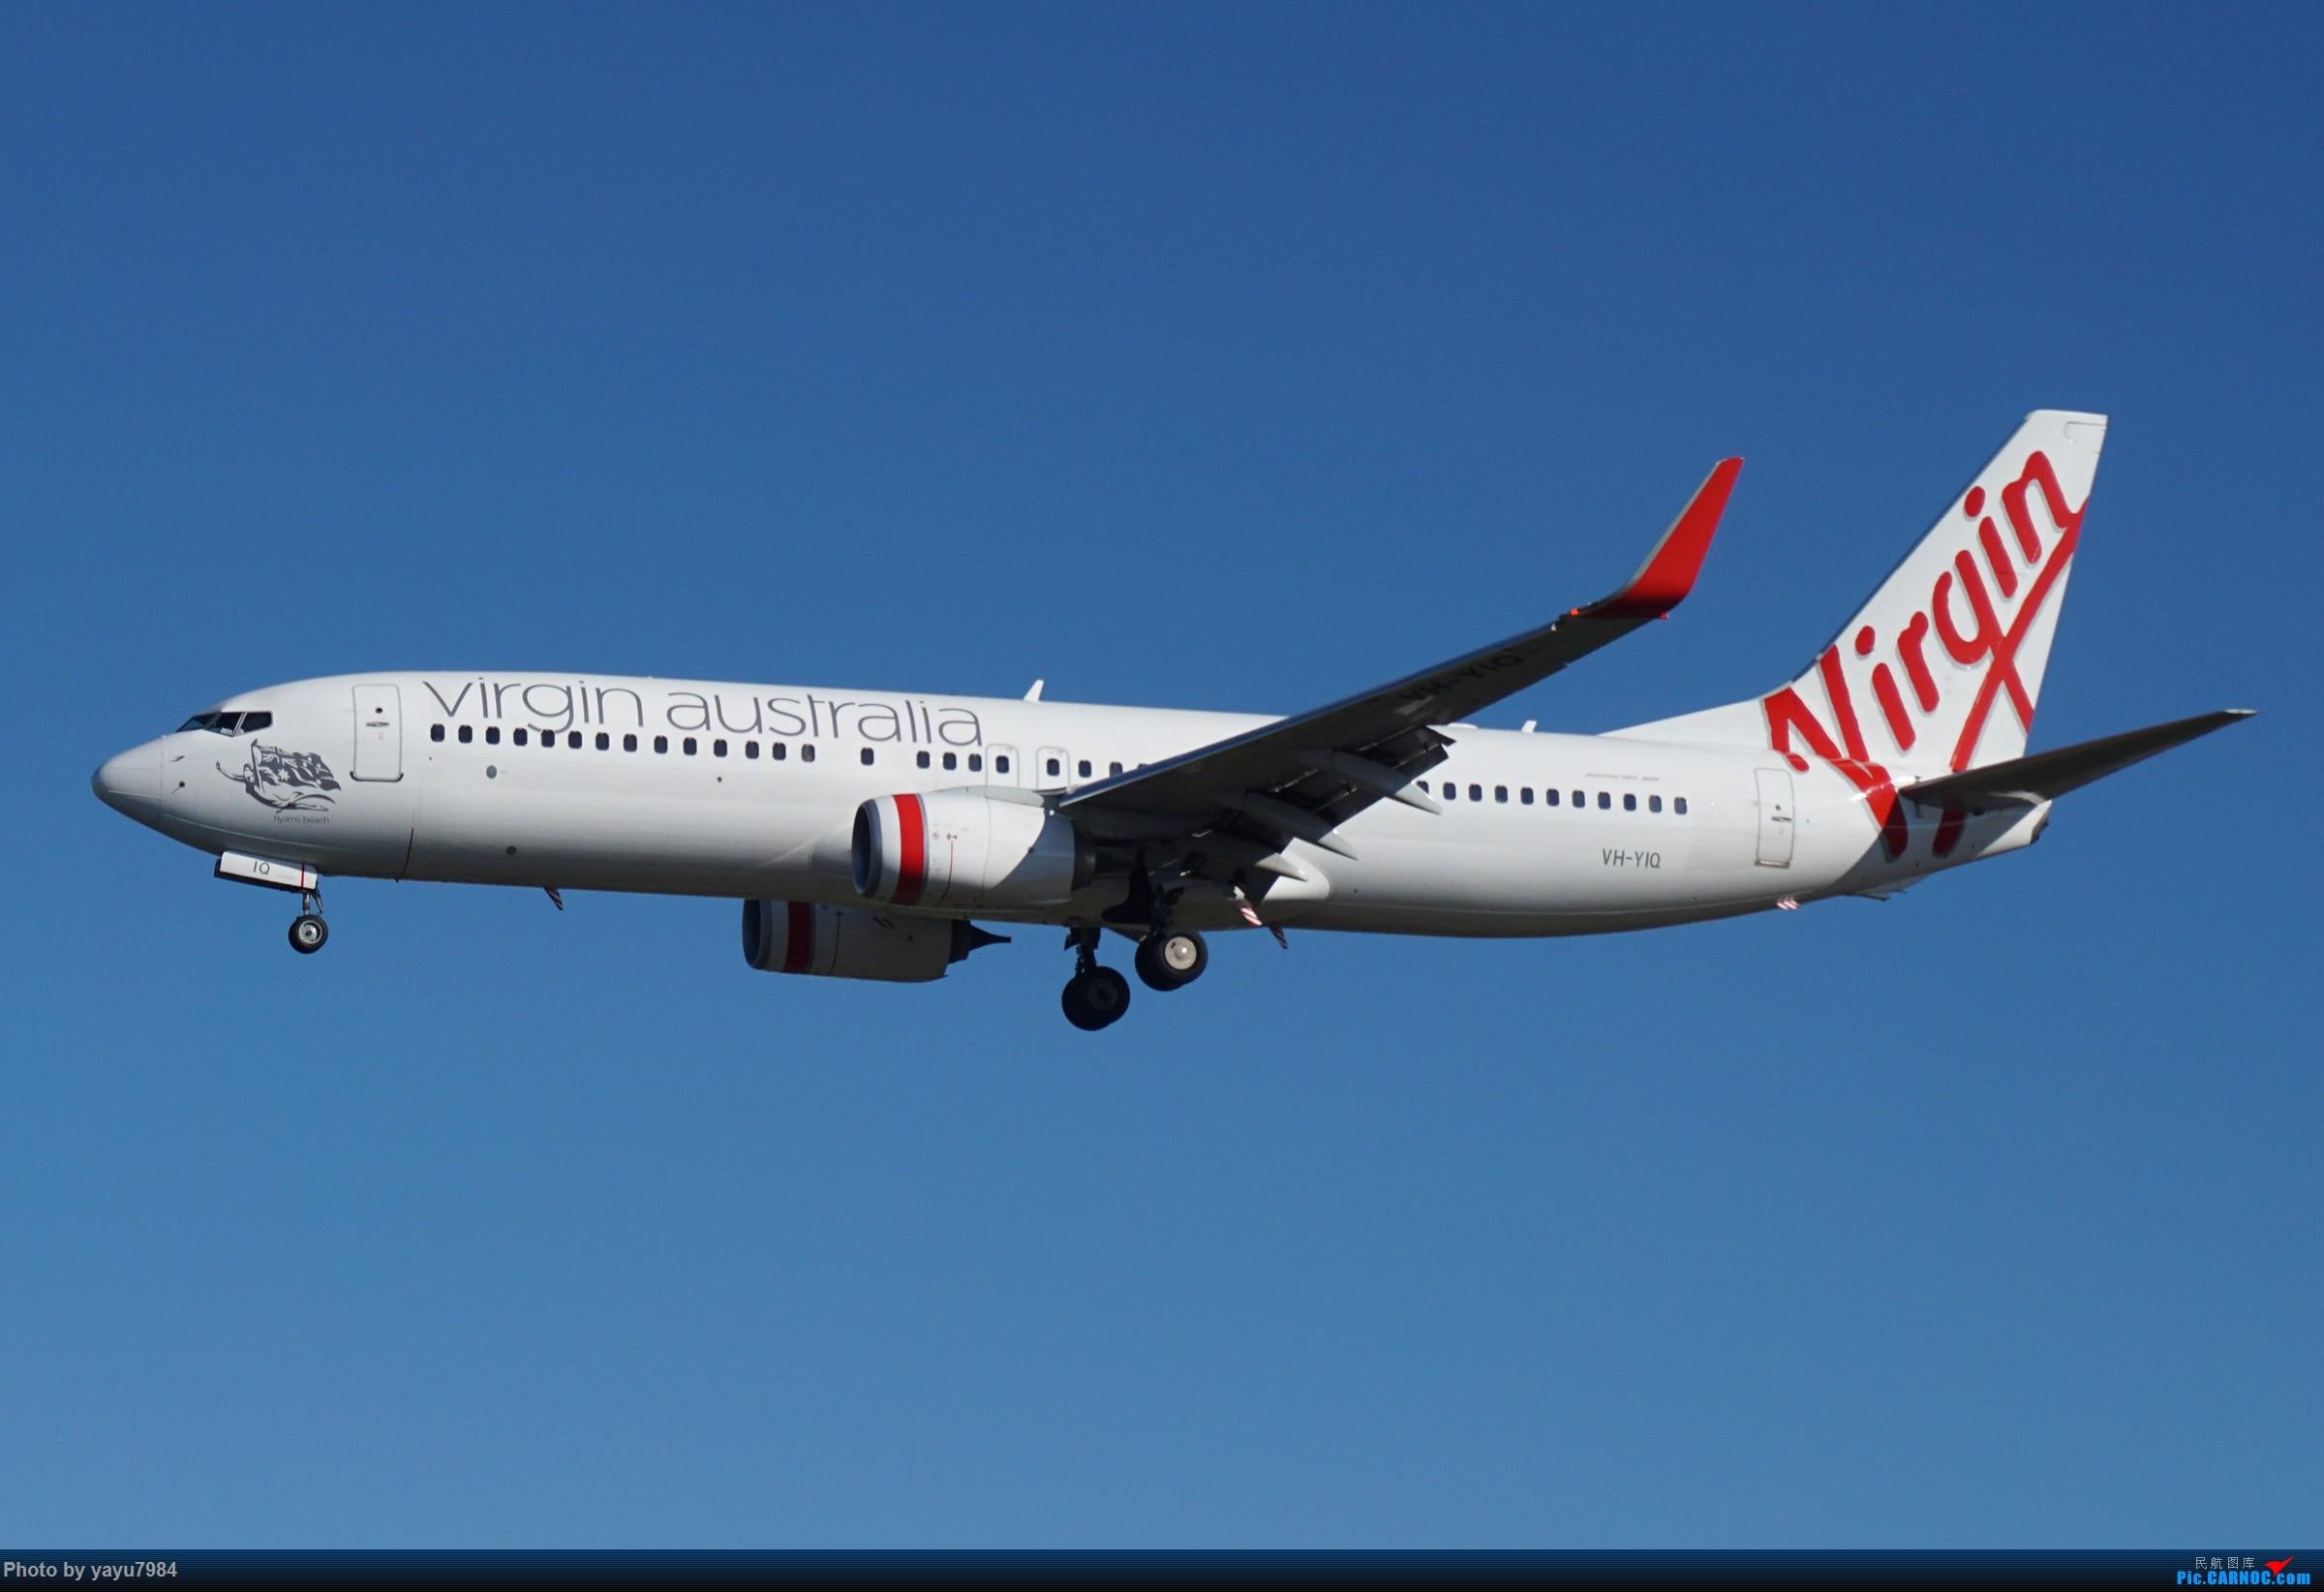 Re:[原创][SYD] 晨悉尼,16R扎堆到达 BOEING 737-800 VH-YIQ 澳大利亚悉尼金斯福德·史密斯机场